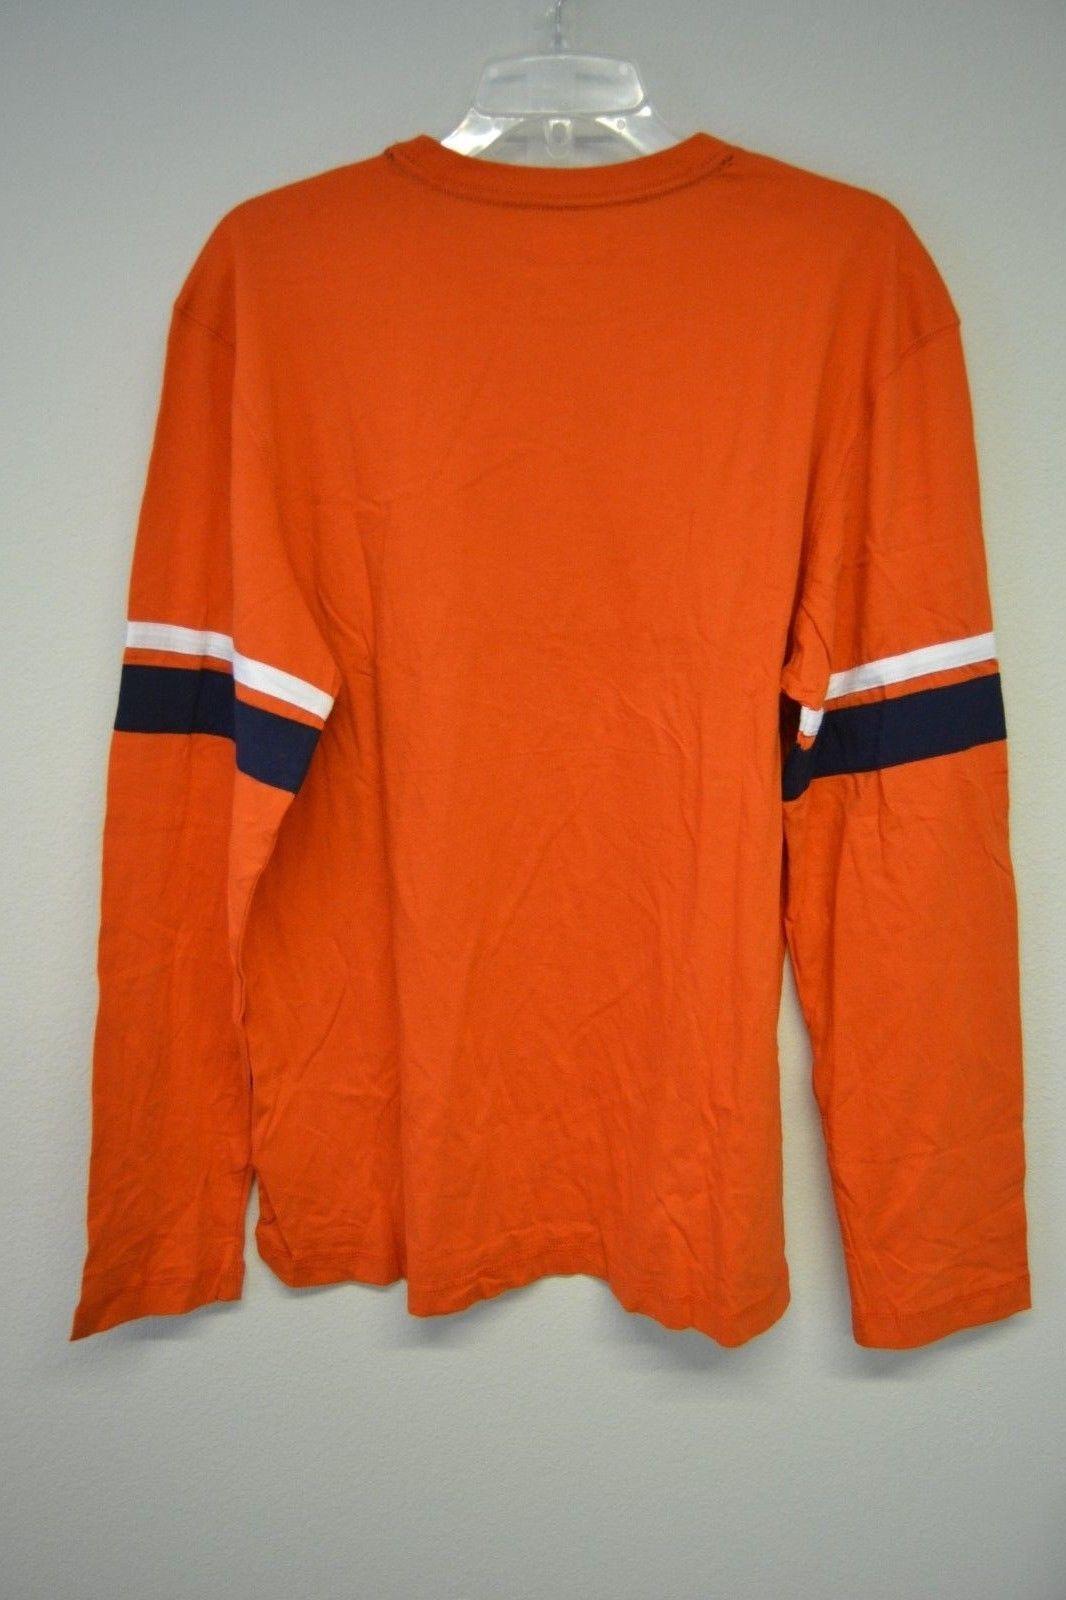 NFL Team Apparel Denver Broncos Orange Long Sleeve Graphic T-Shirt Sz L NWT image 5